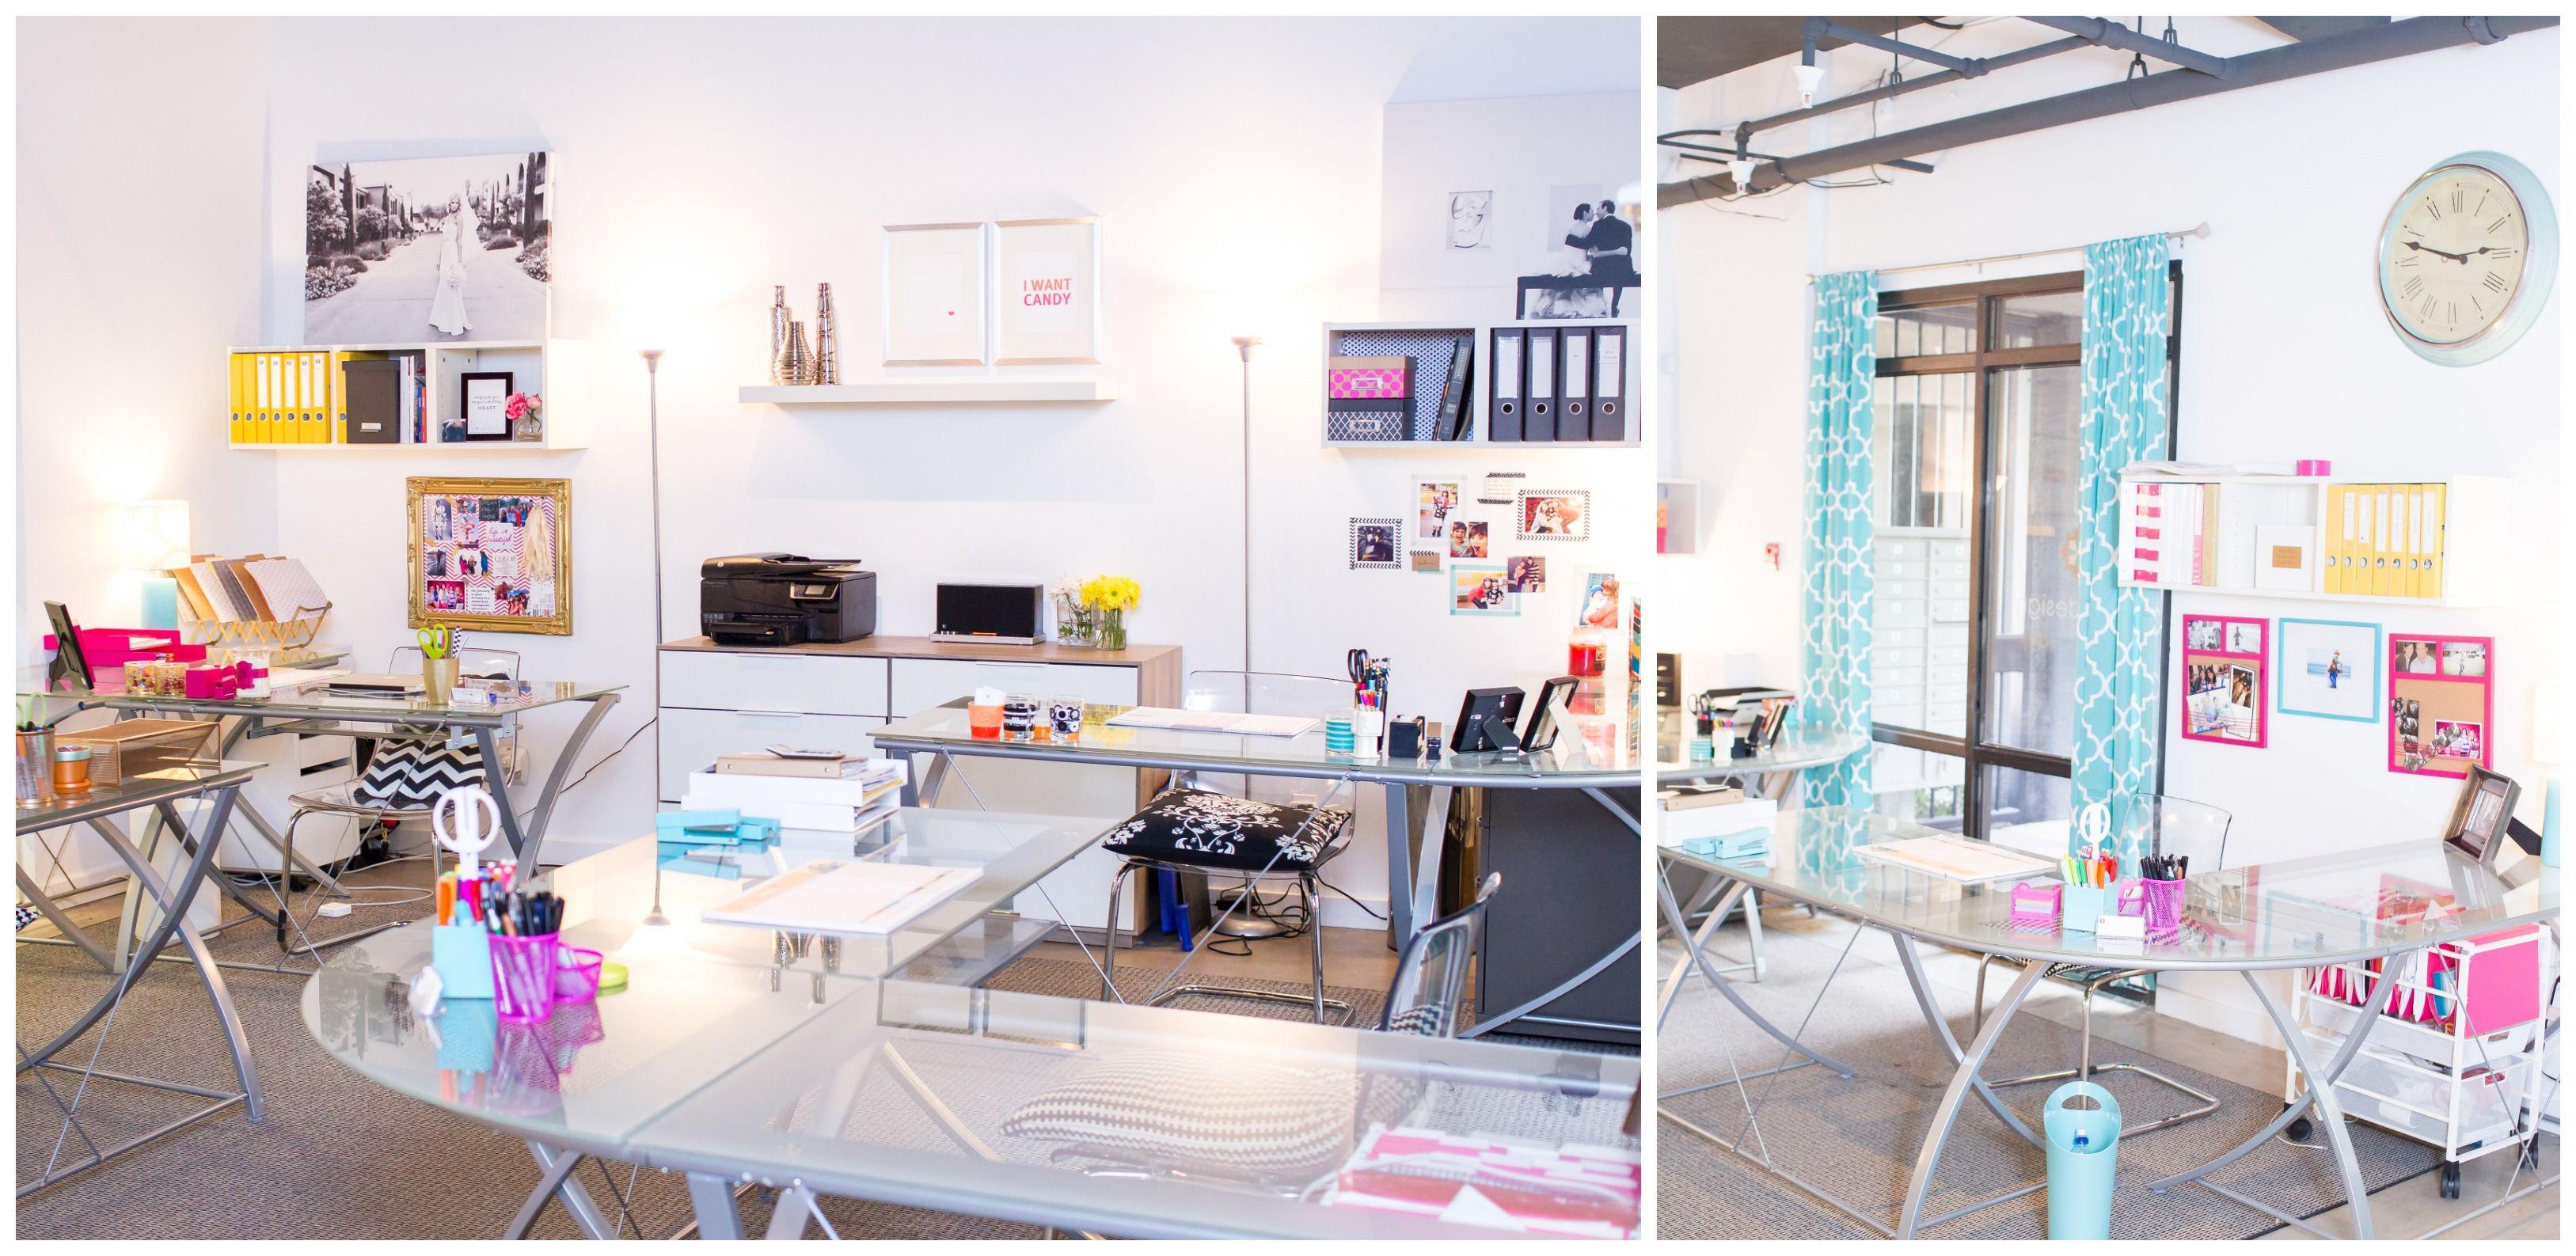 Decorating ideas pinterest joy studio design - Wedding Planner Office Google Search